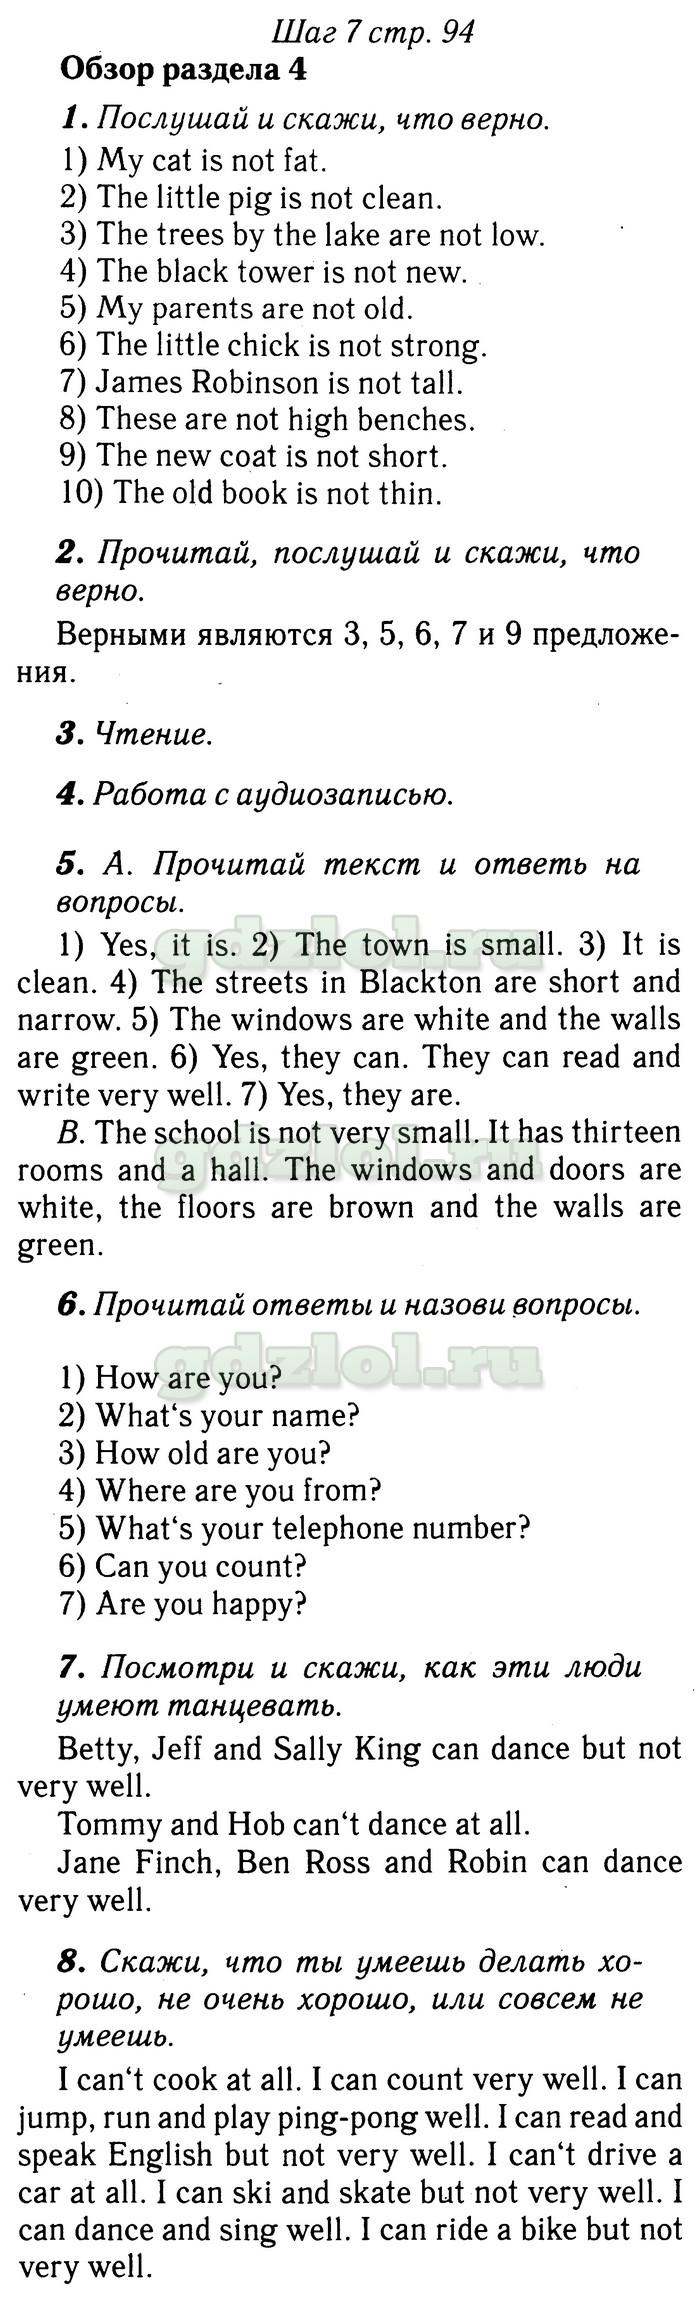 Гдз по англ языку 6 класс афанасьева